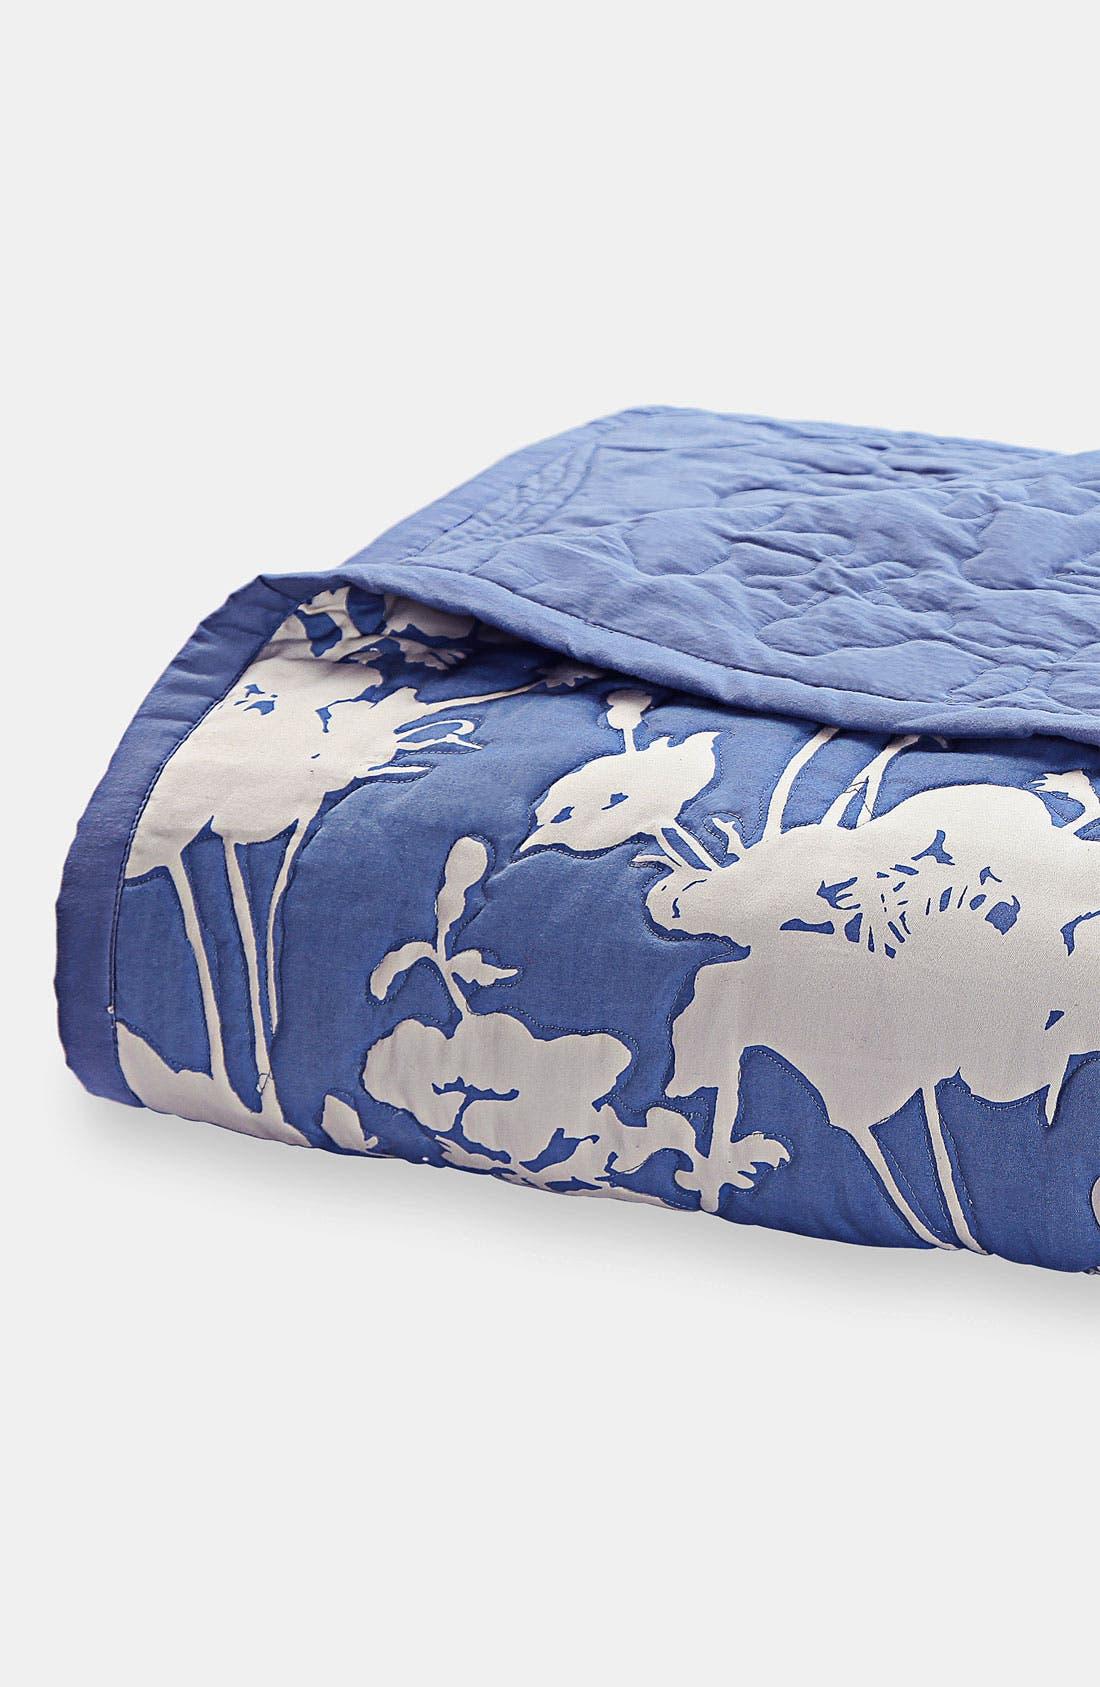 Alternate Image 1 Selected - kate spade new york 'floral' quilt